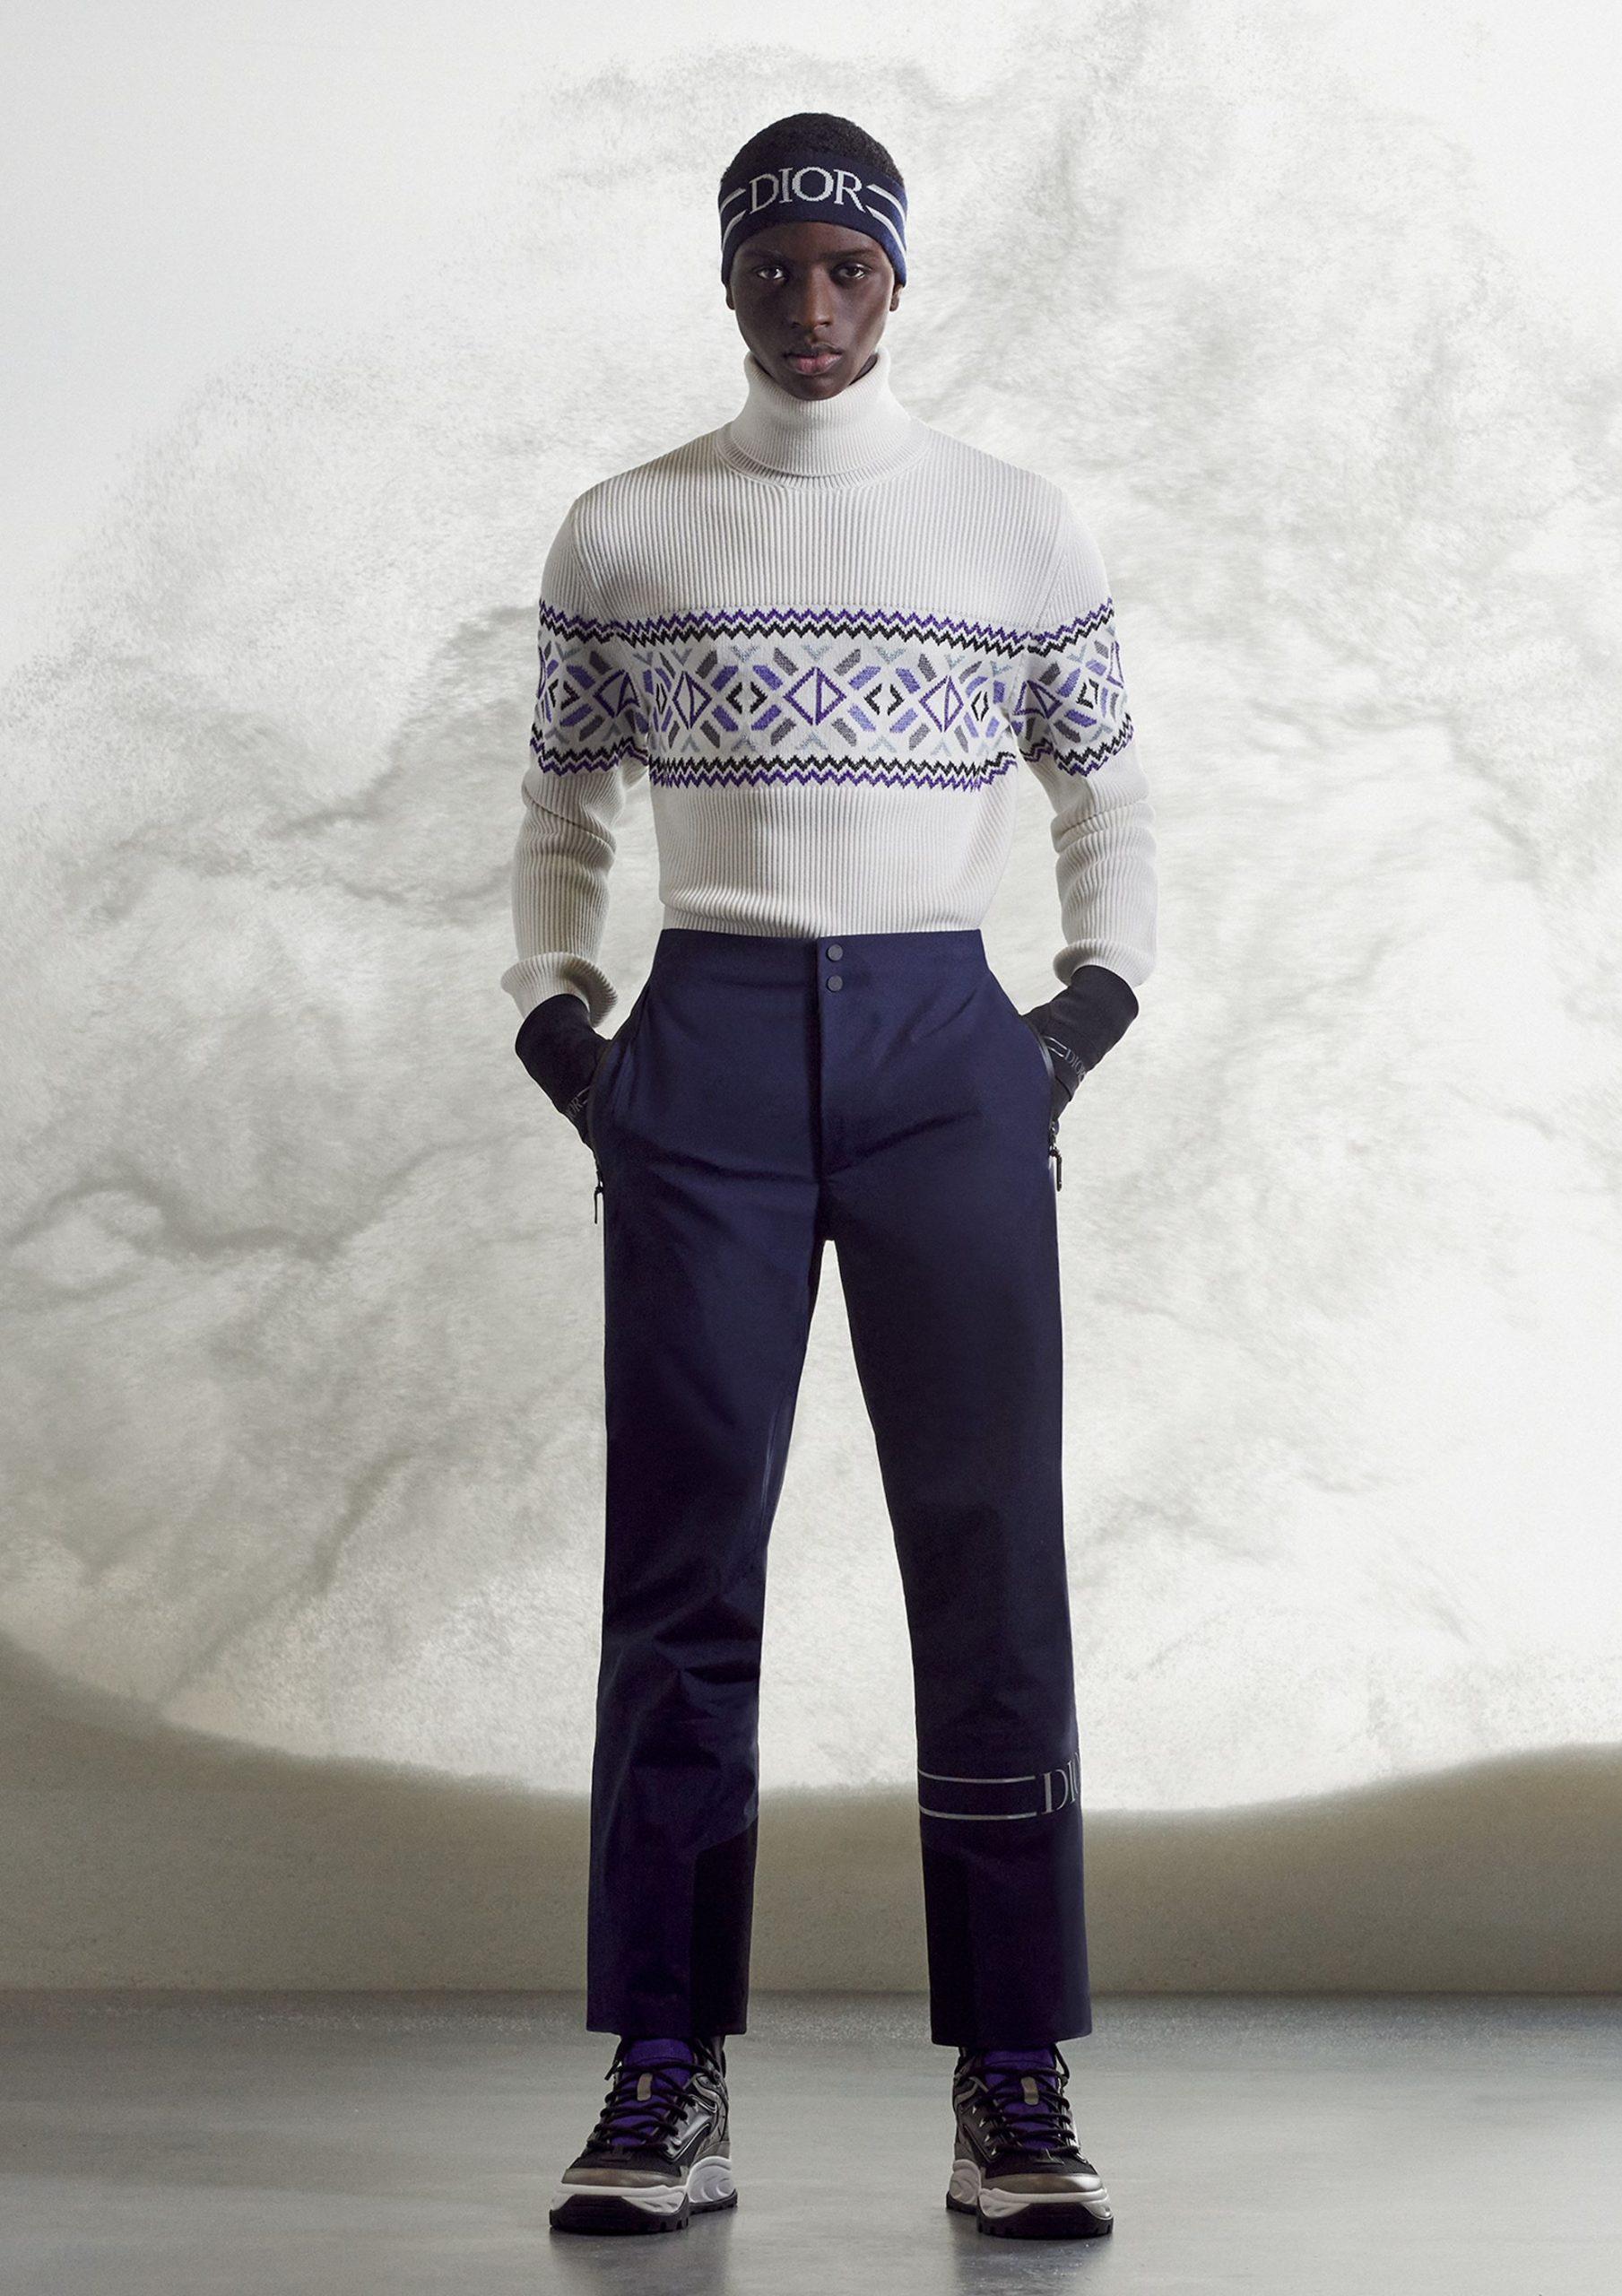 Dior Men's Ski Collaboration Collection